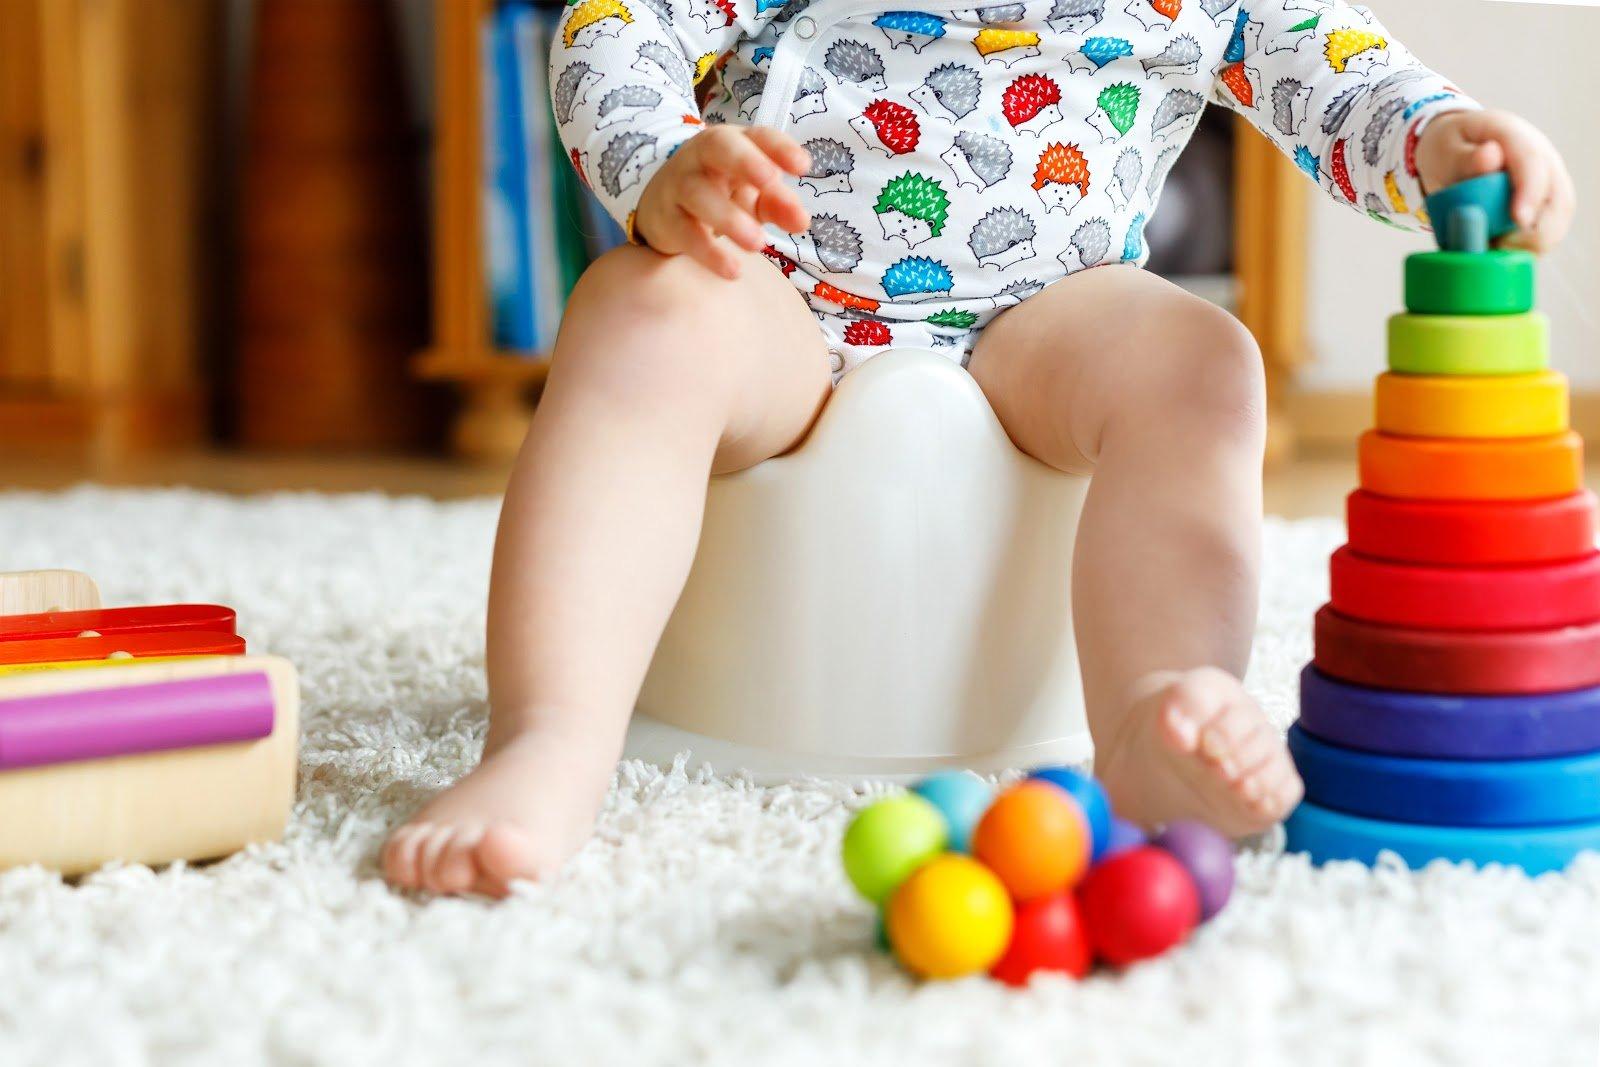 waktu-yang-tepat-untuk-potty-training.jpg